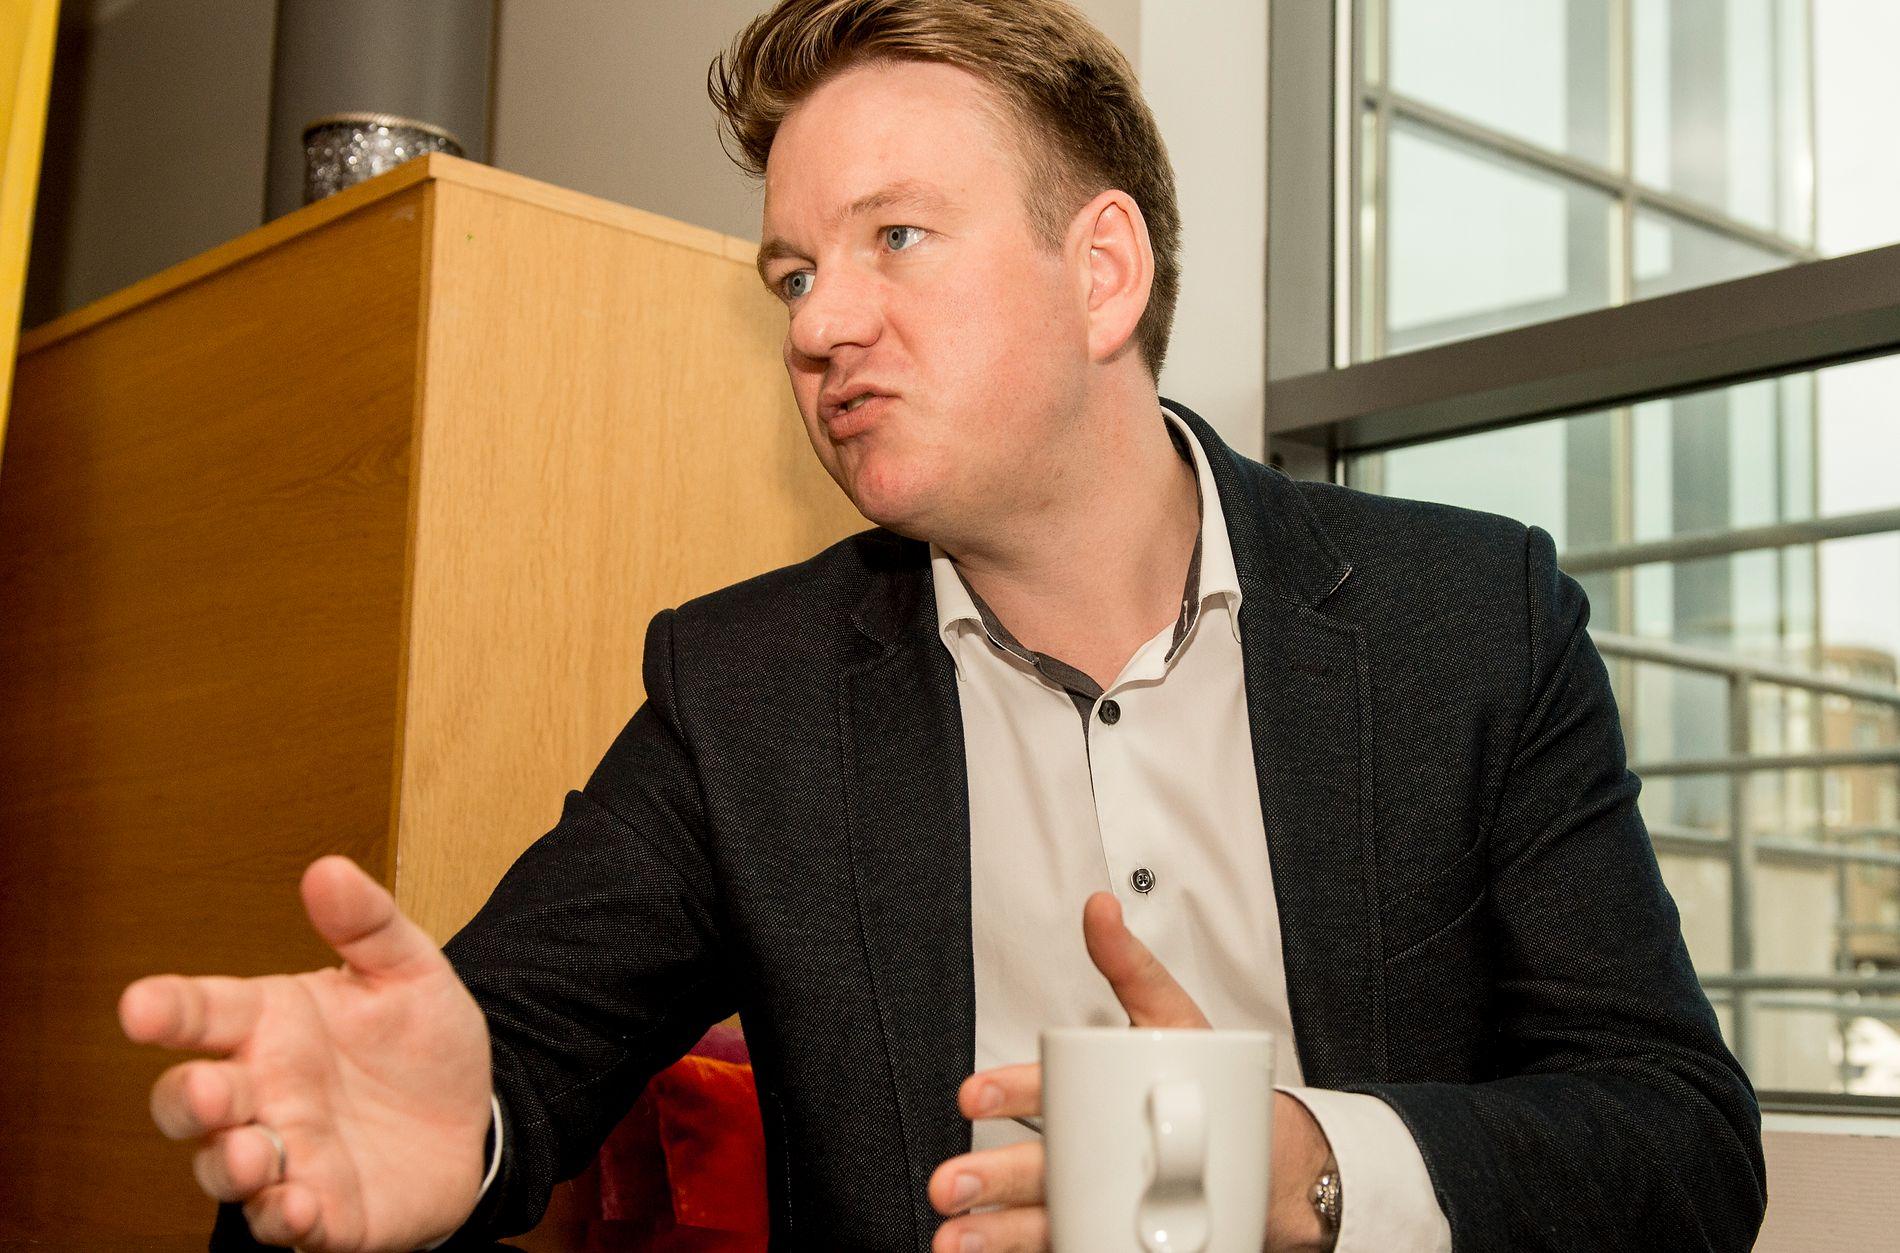 STØTTER MOBBEOFRE: Stortingsrepresentant Anders Tyvand (KrF) er medlem i Stortingets utdanningskomité.